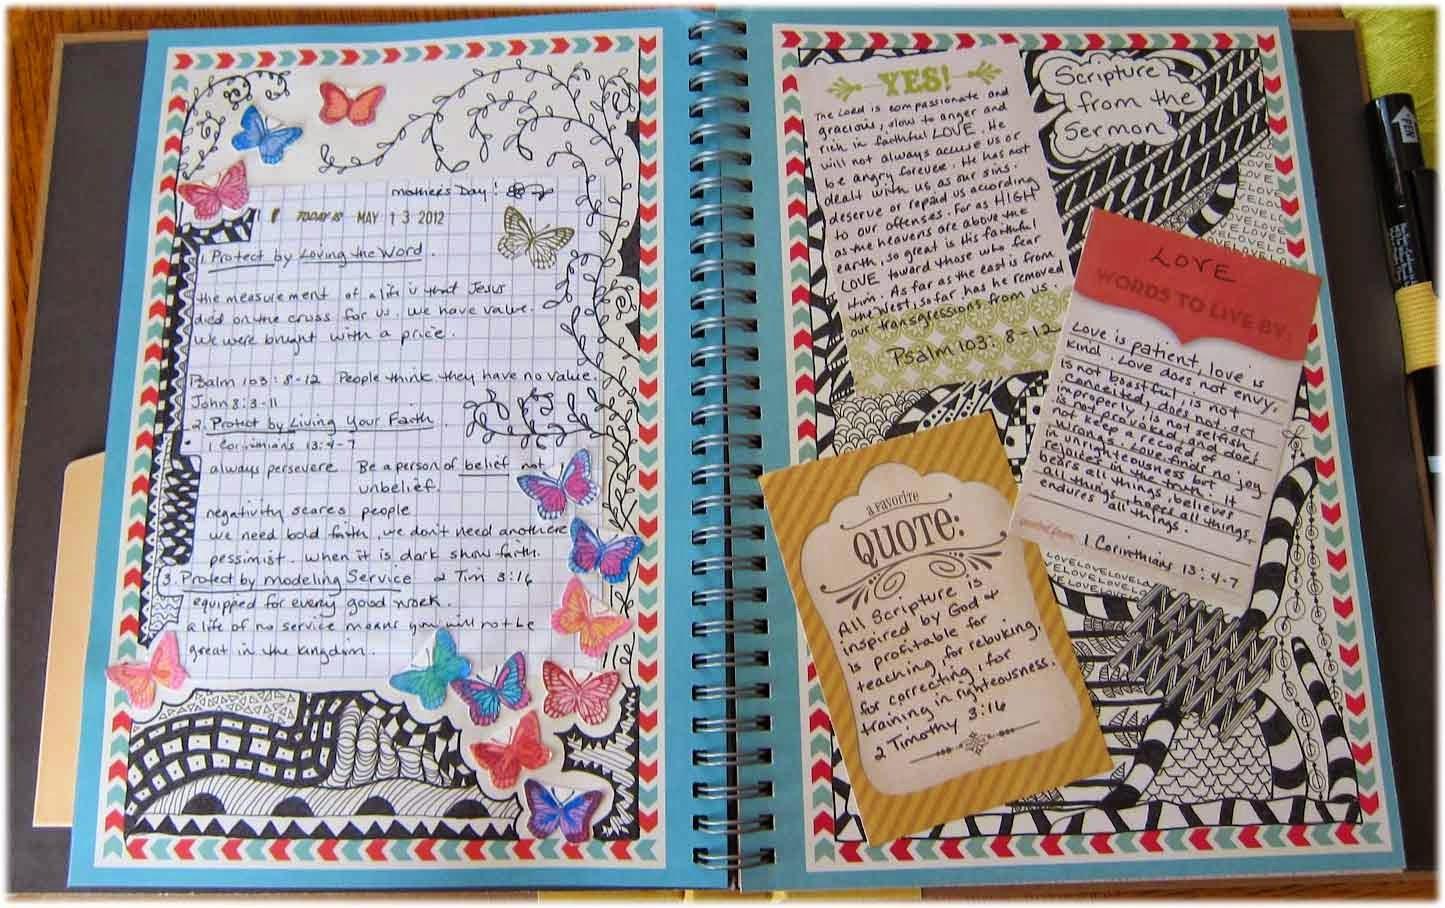 A mi manera mira como adornar tu cuaderno por dentro - Decorar album de fotos por dentro ...